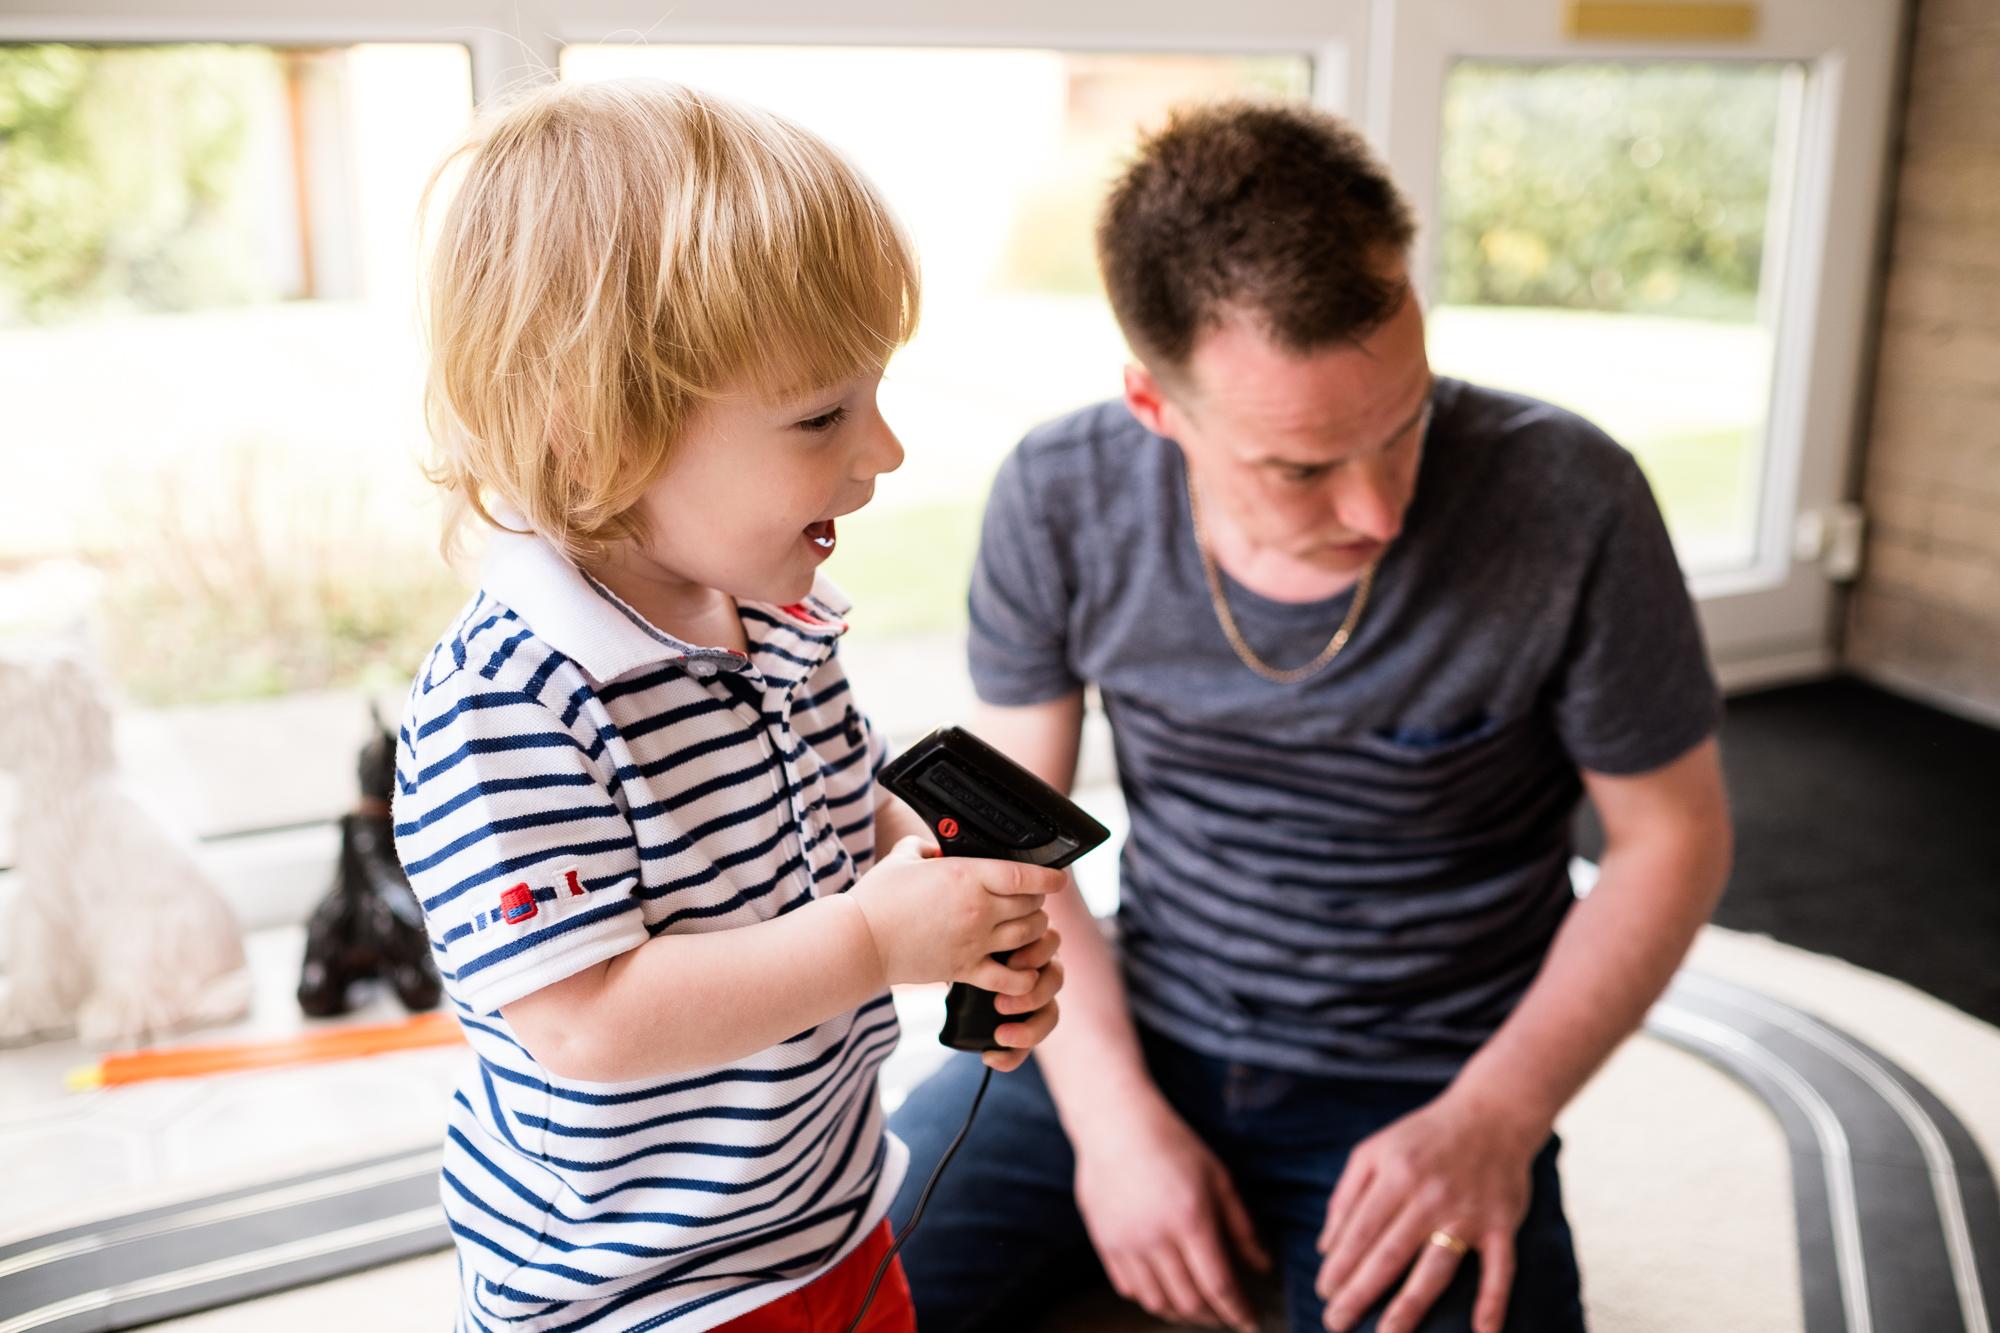 Family Lifestyle Documentary Photography Newborn Photos Candid Family Photographer - Jenny Harper Photography-20.jpg